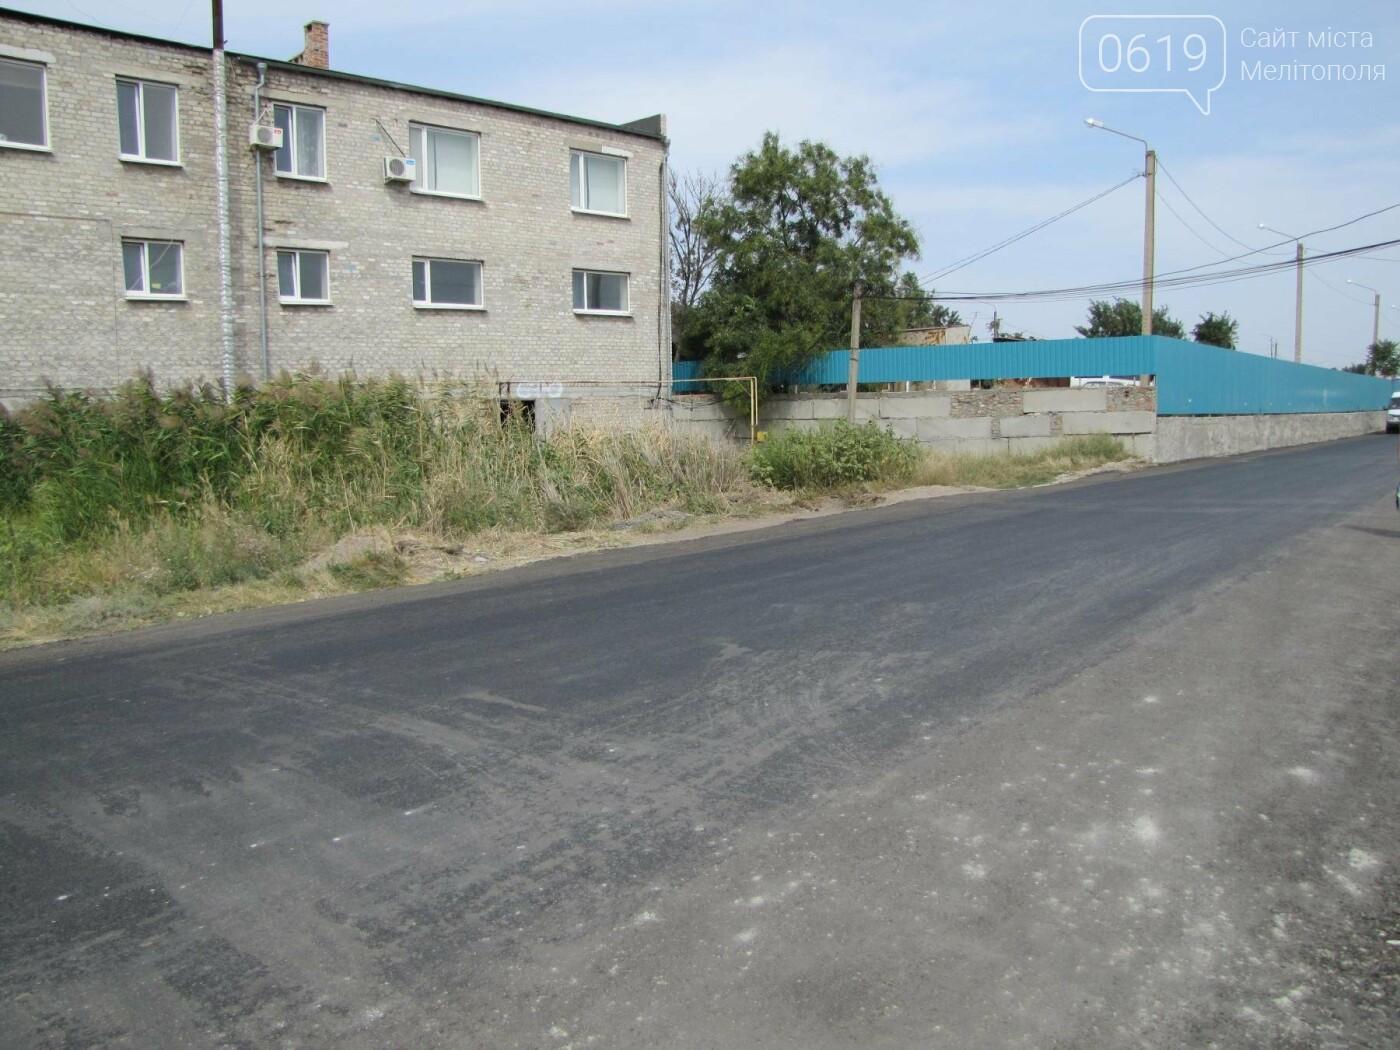 В Мелитополе отремонтировали дорогу на окраине, фото-5, Фото сайта 0619